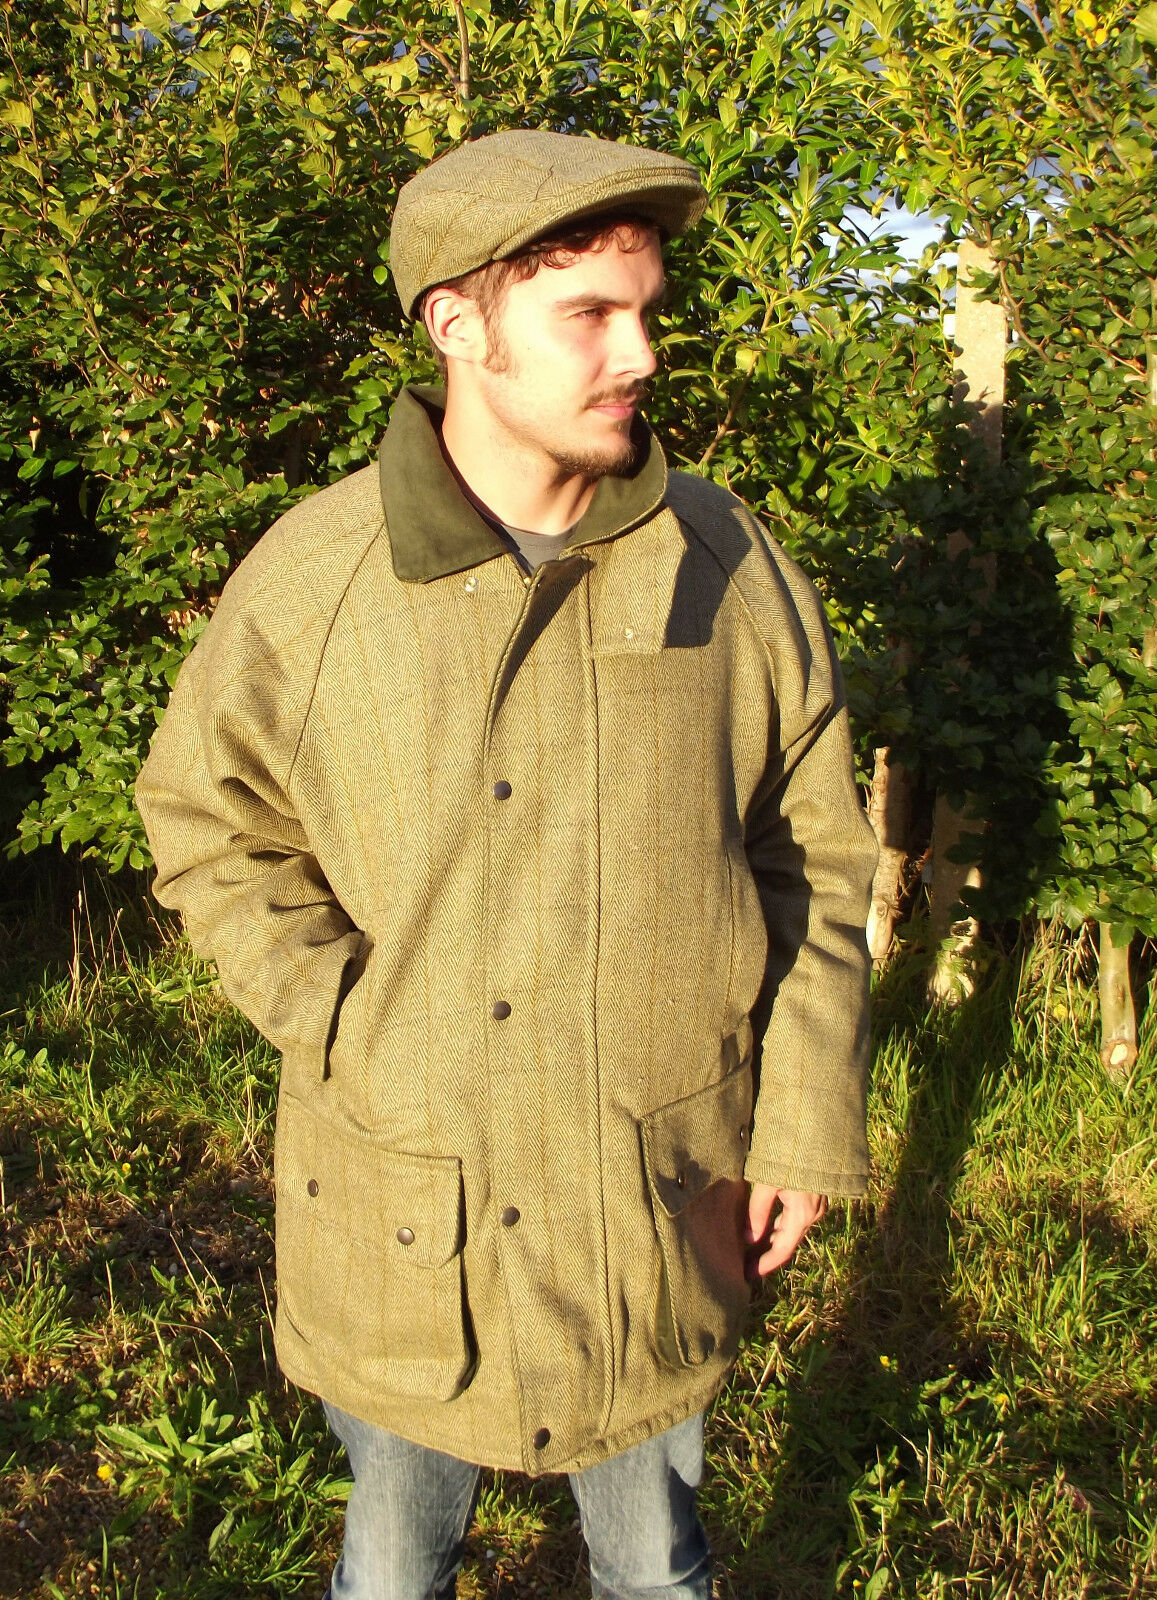 Veste Tweed Tweed Veste Hommes Fabriquée En Angleterre Moleskine Collier Vert Du S au 0d454b